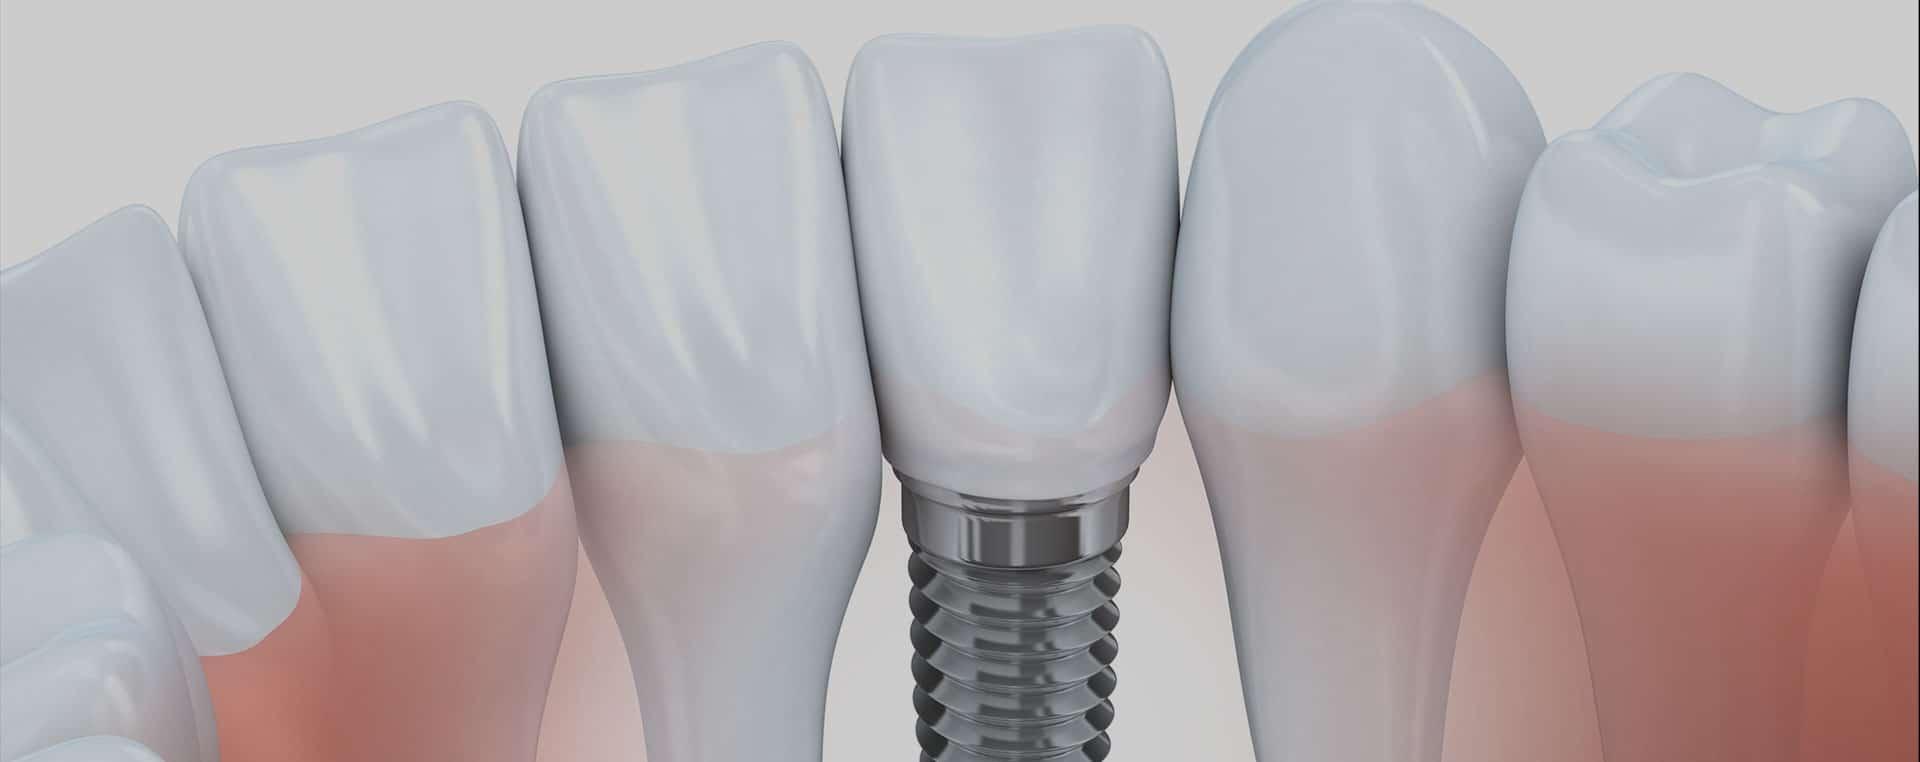 yardley dental implants dentist